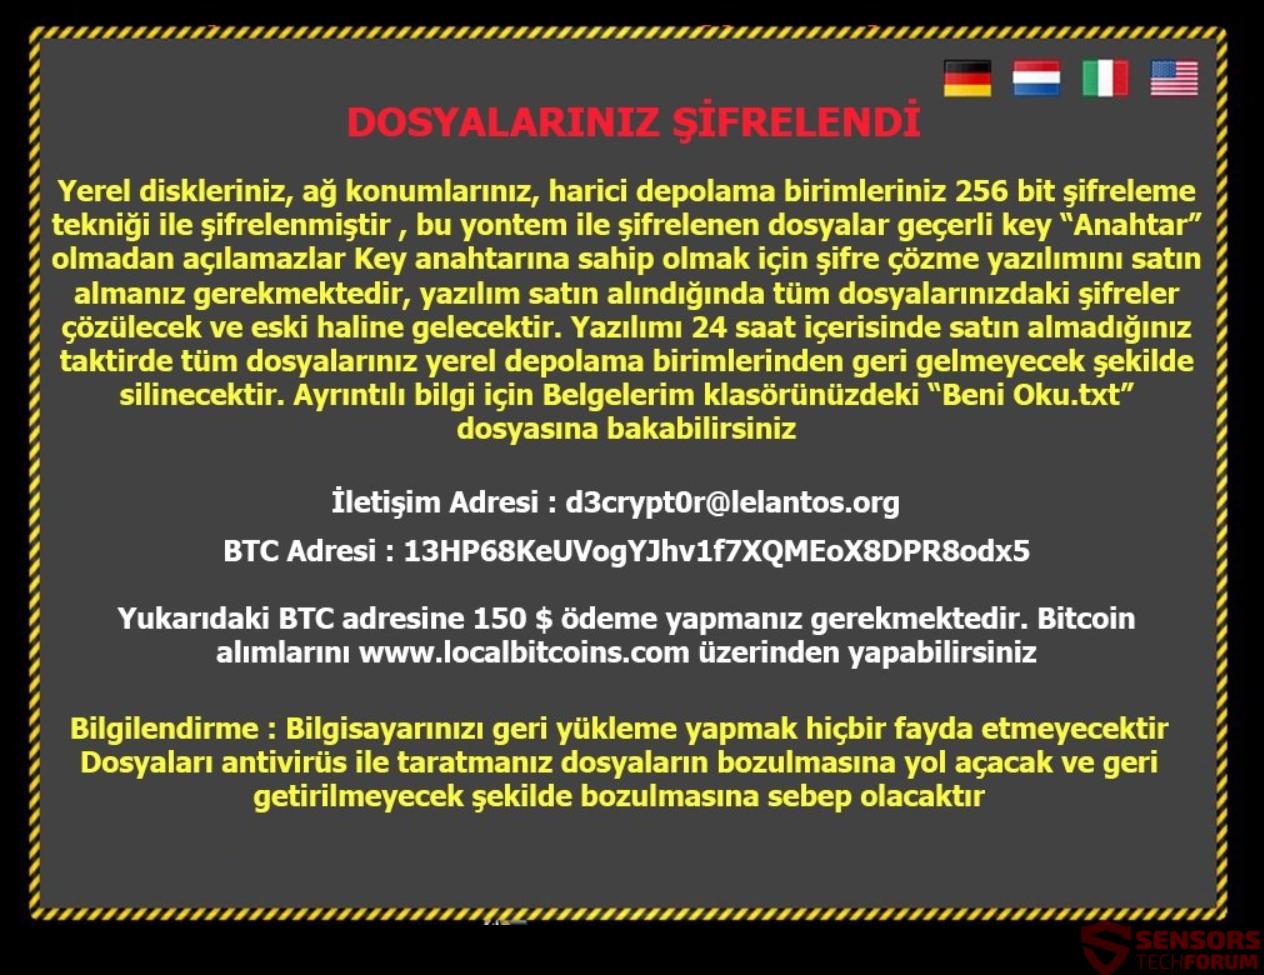 Beni Oku txt Turkish Virus – Remove and Restore  encrypted Files